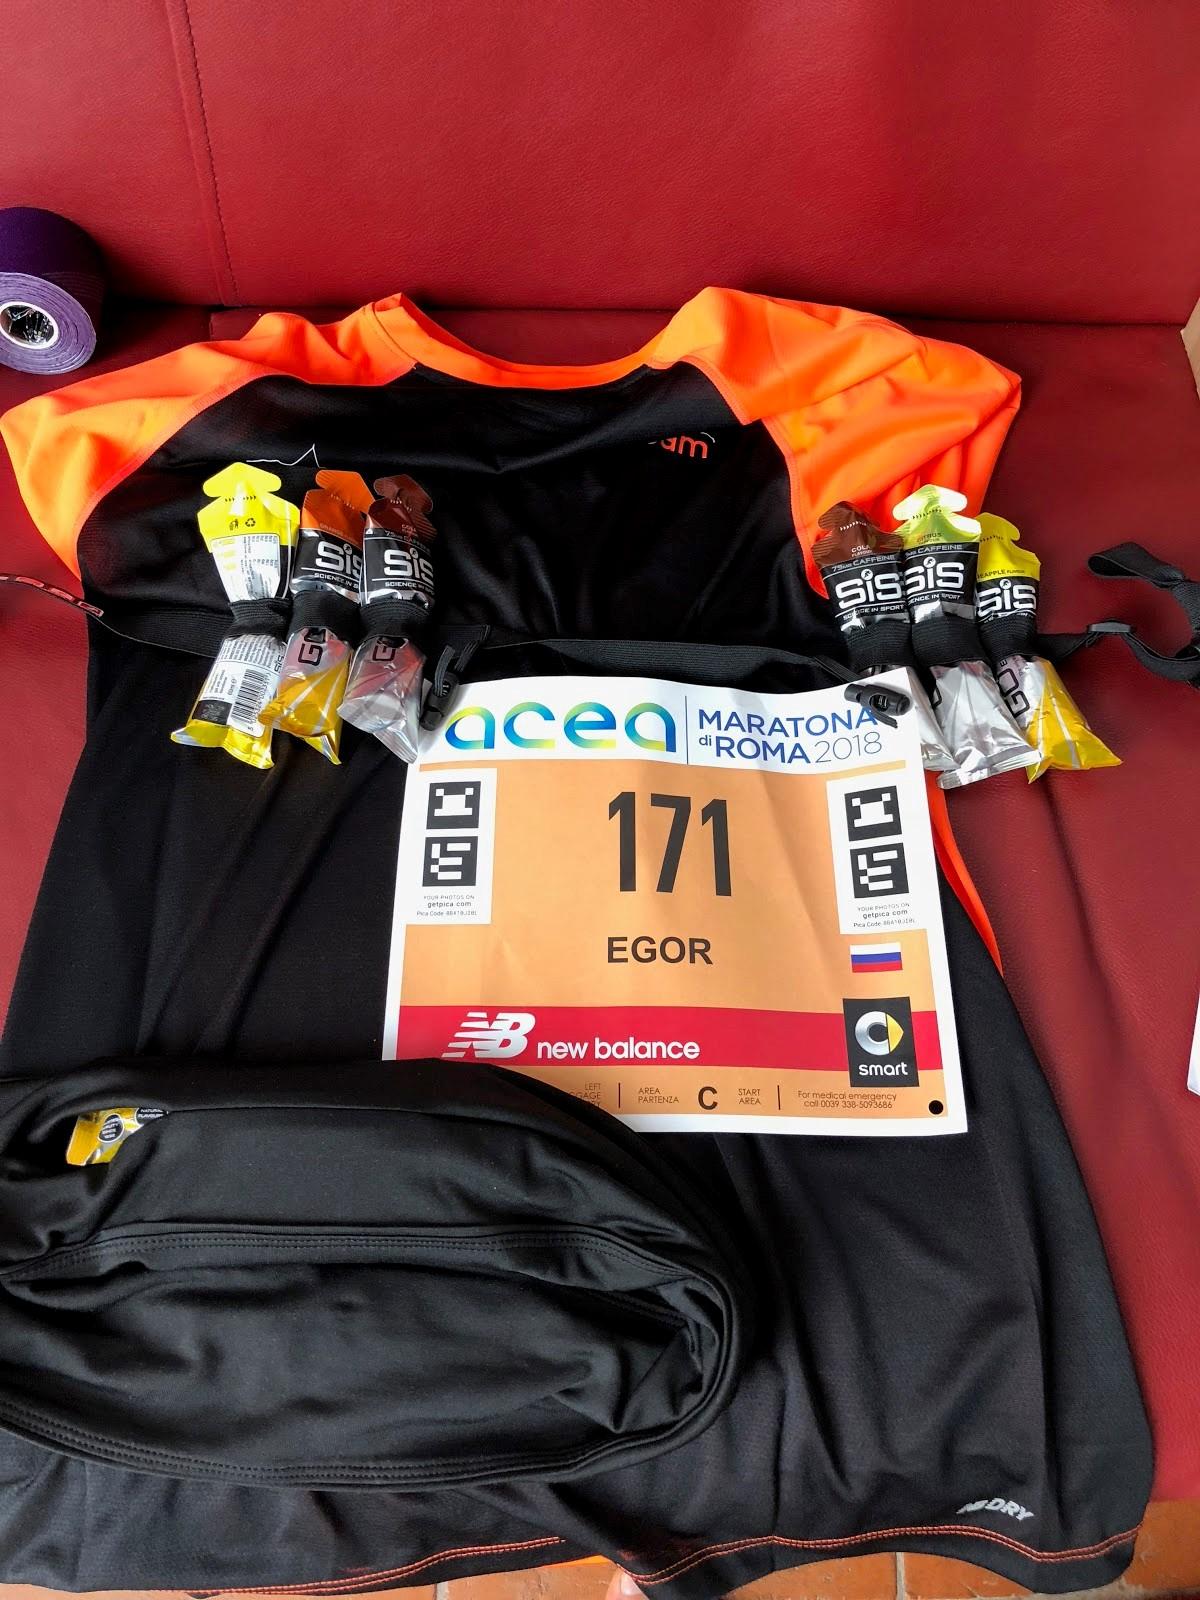 [Хабра-оффтоп] Maratona di Roma, или первый марафон для ИТ-шника - 12